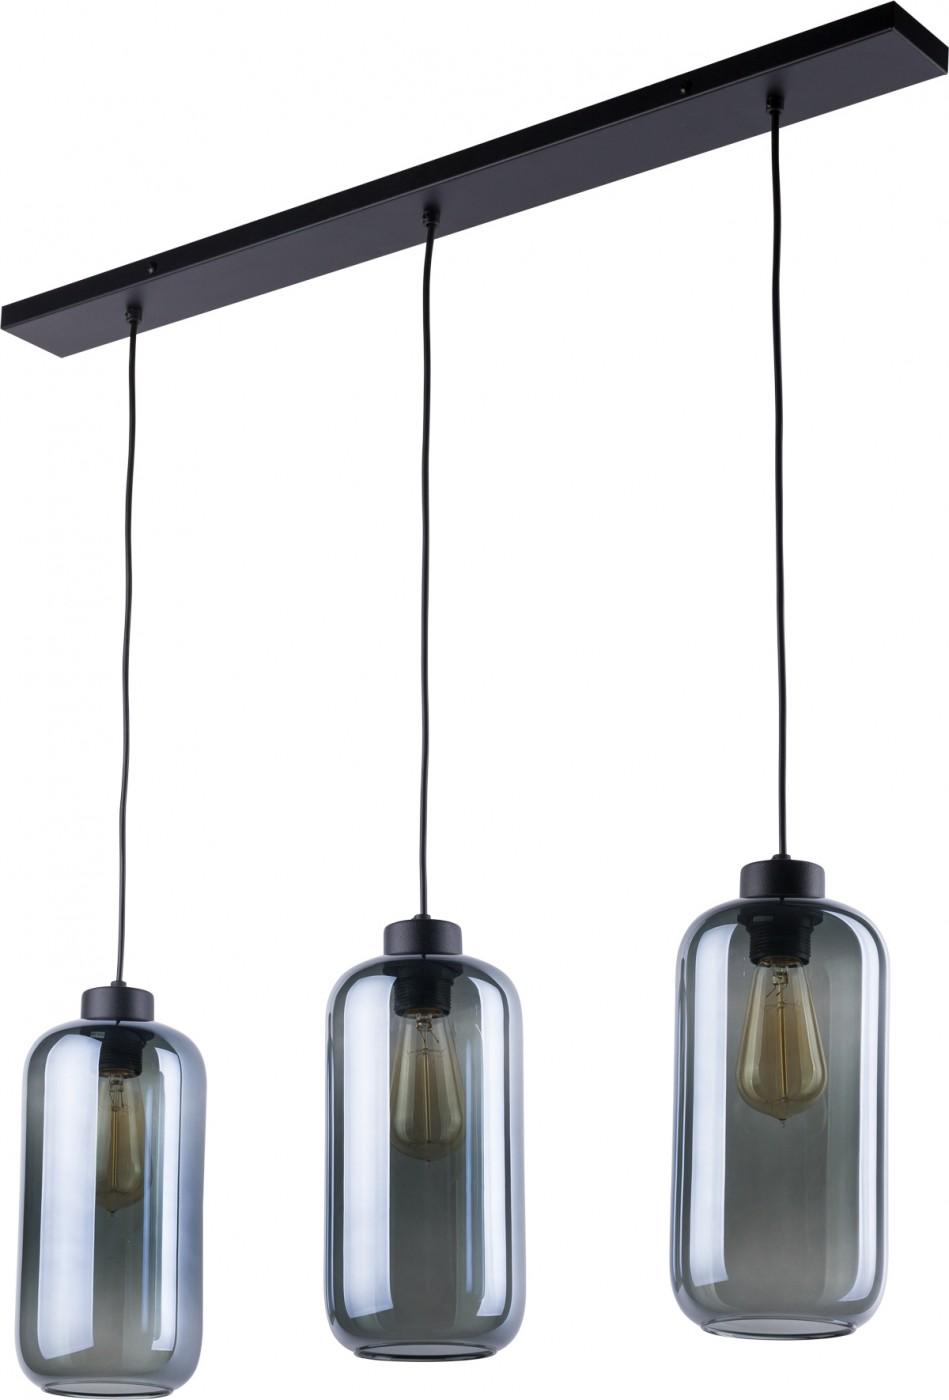 TK Lighting TK-2078 Marco függeszték